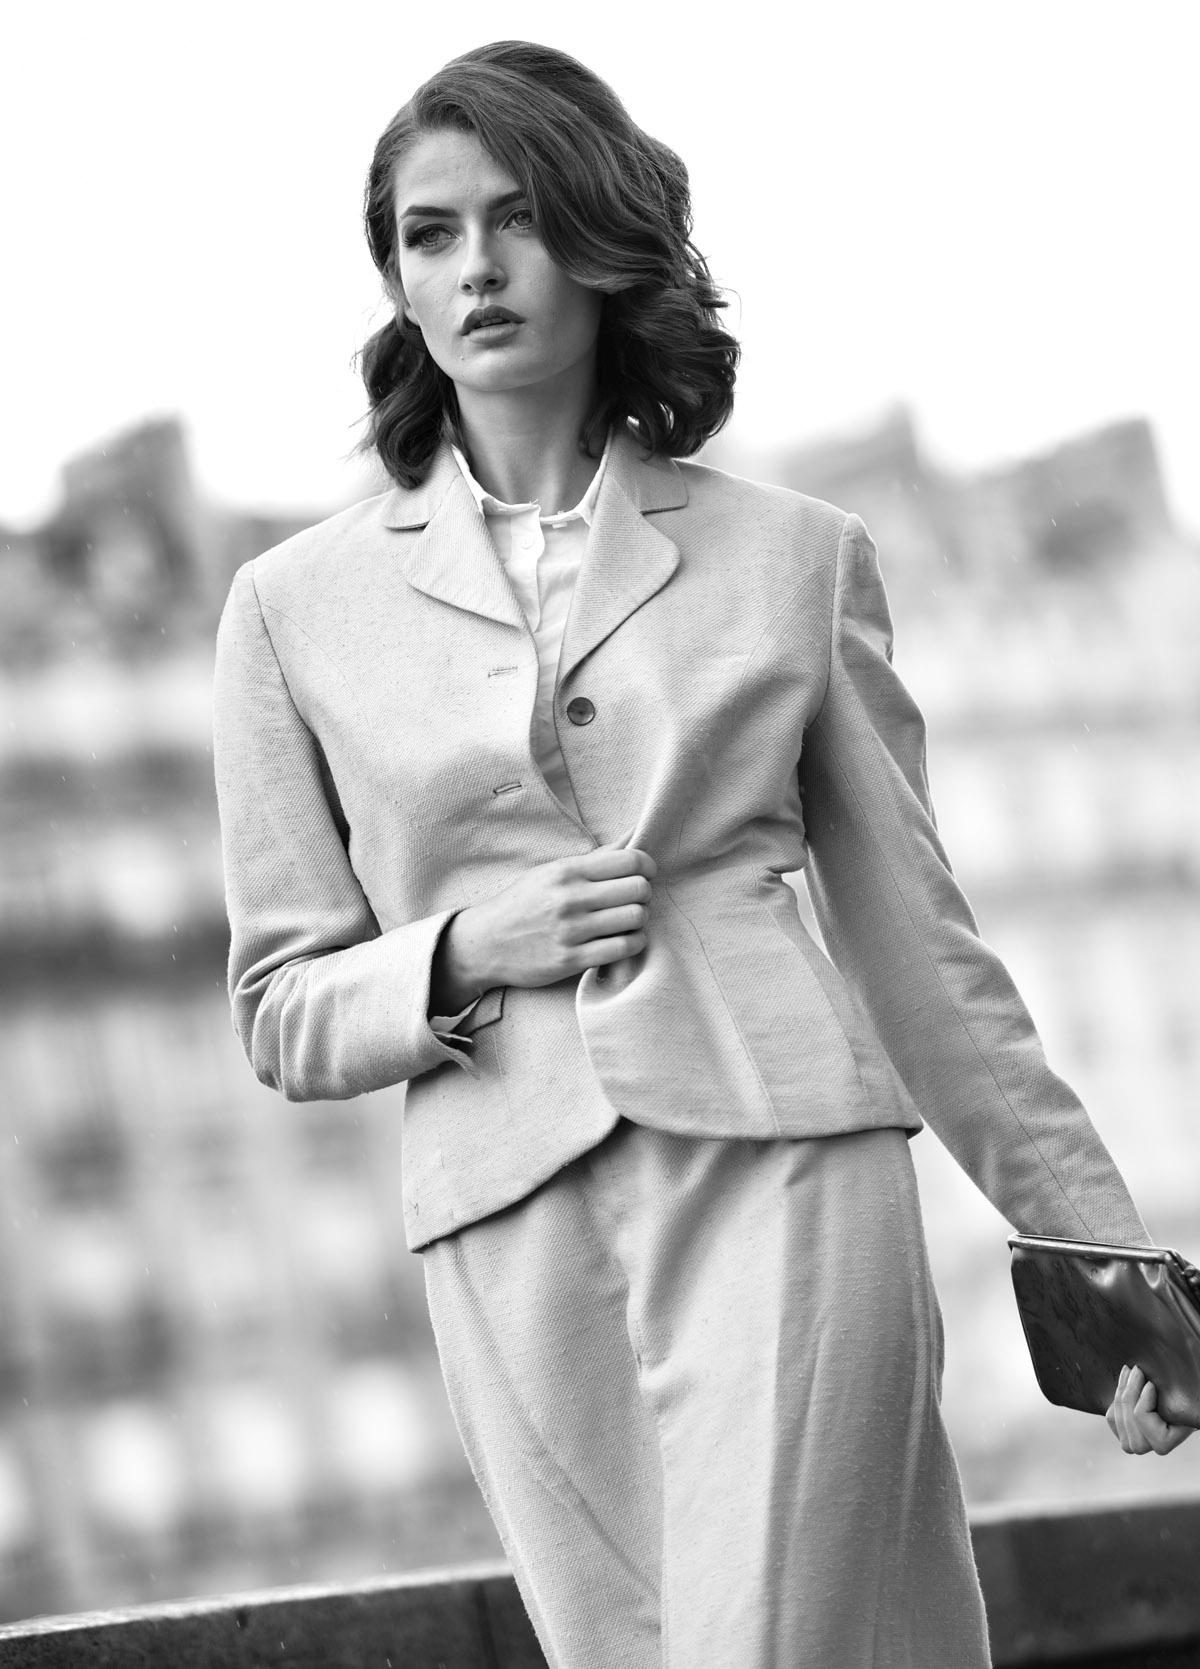 Paris Female couple Editorial - nouvelle Romance homage by Peter Mueller Photography 3